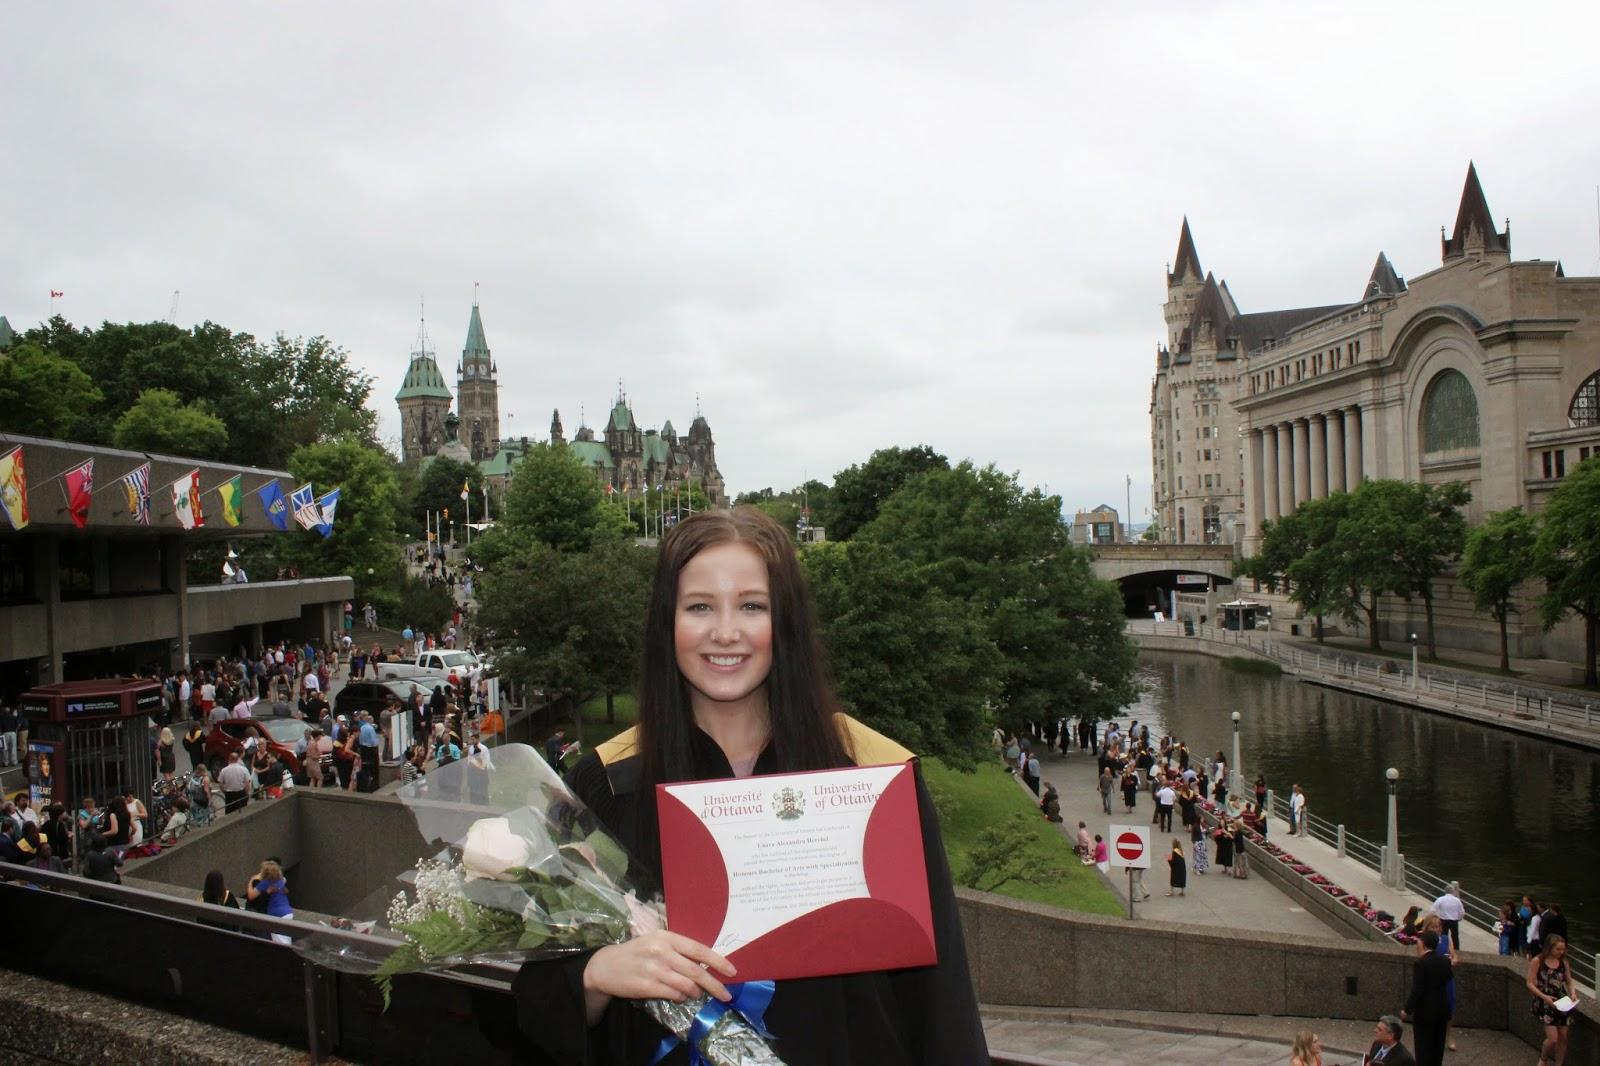 Graduation Ceremony and Parliament Hill